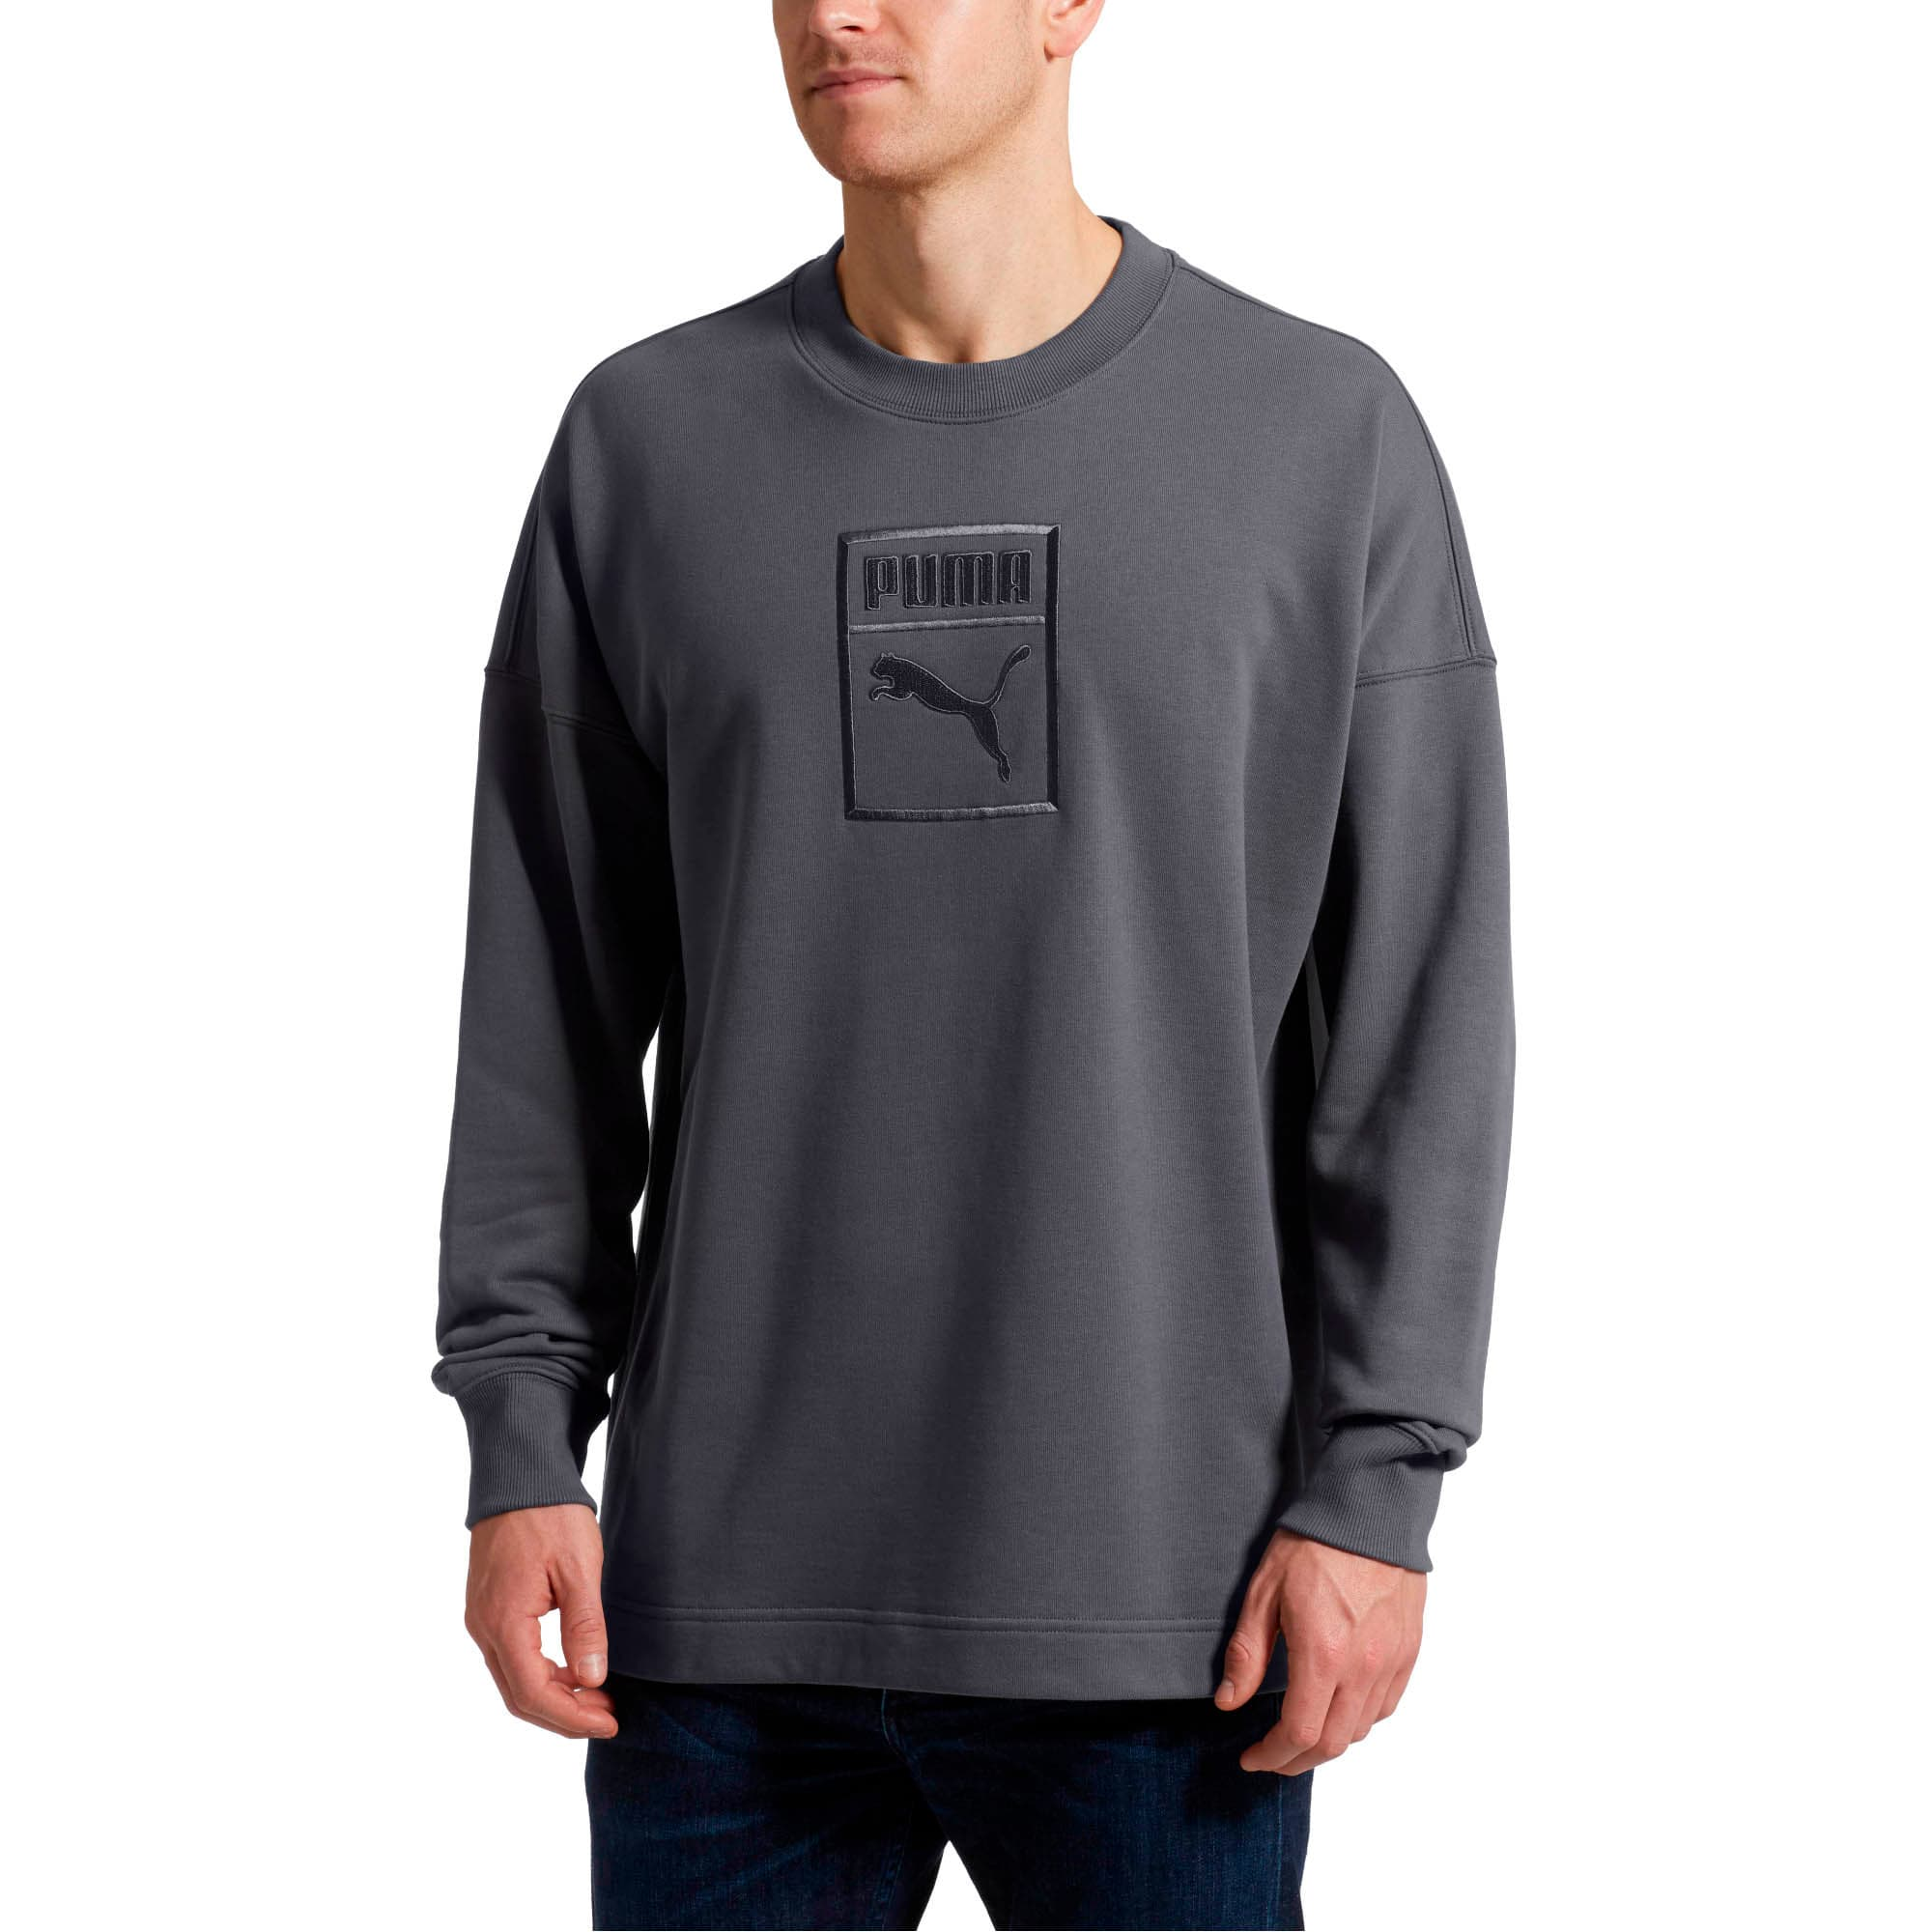 Thumbnail 2 of Classics Men's Downtown Sweater, Iron Gate, medium